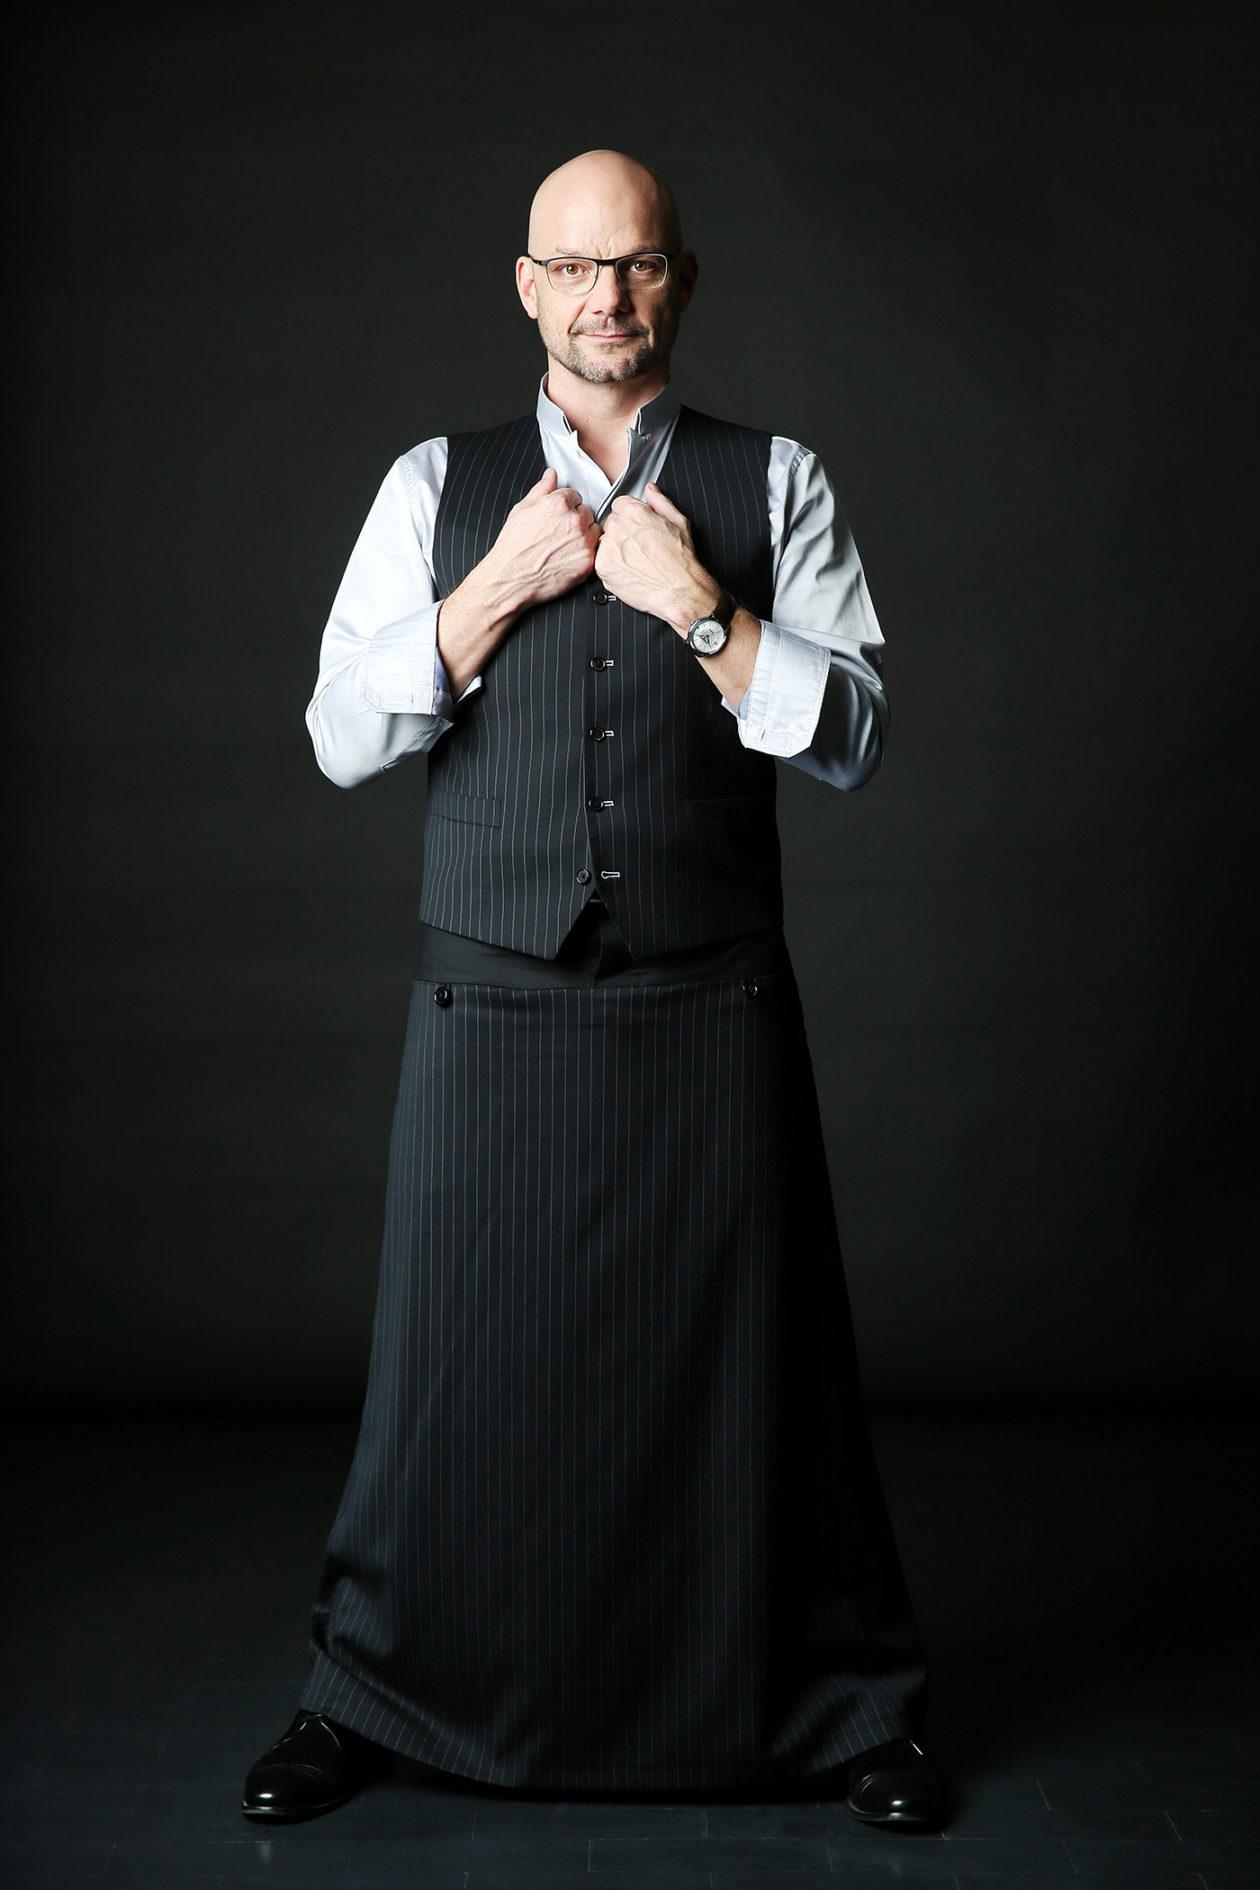 Alexandre Peraldi